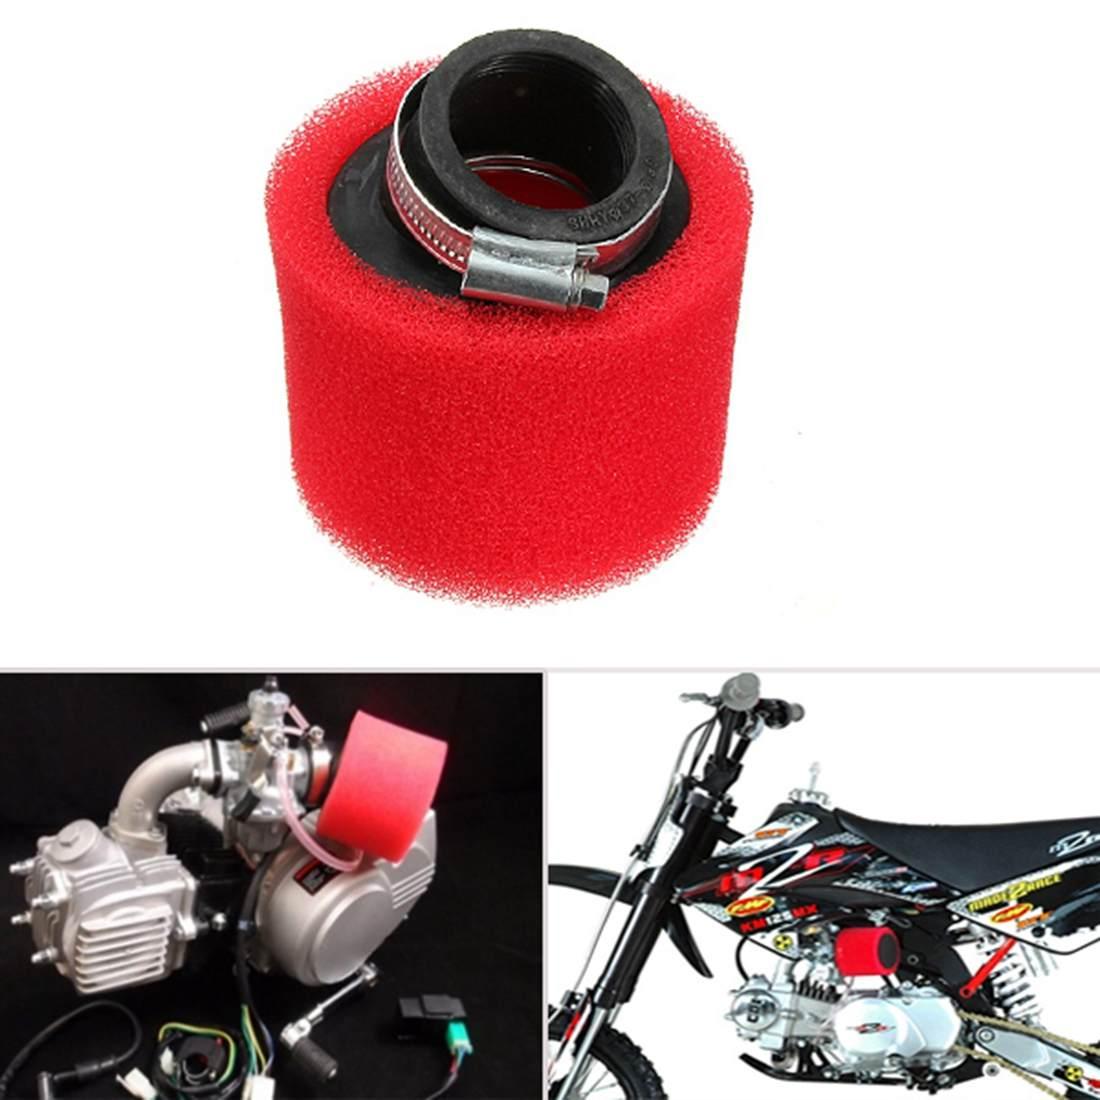 38mm 40mm ATV PIT DIRT BIKE 45 Grad ABGEWINKELT FOAM Air Filter Reiniger 110cc 125cc ROT CRF50 XR50 CRF